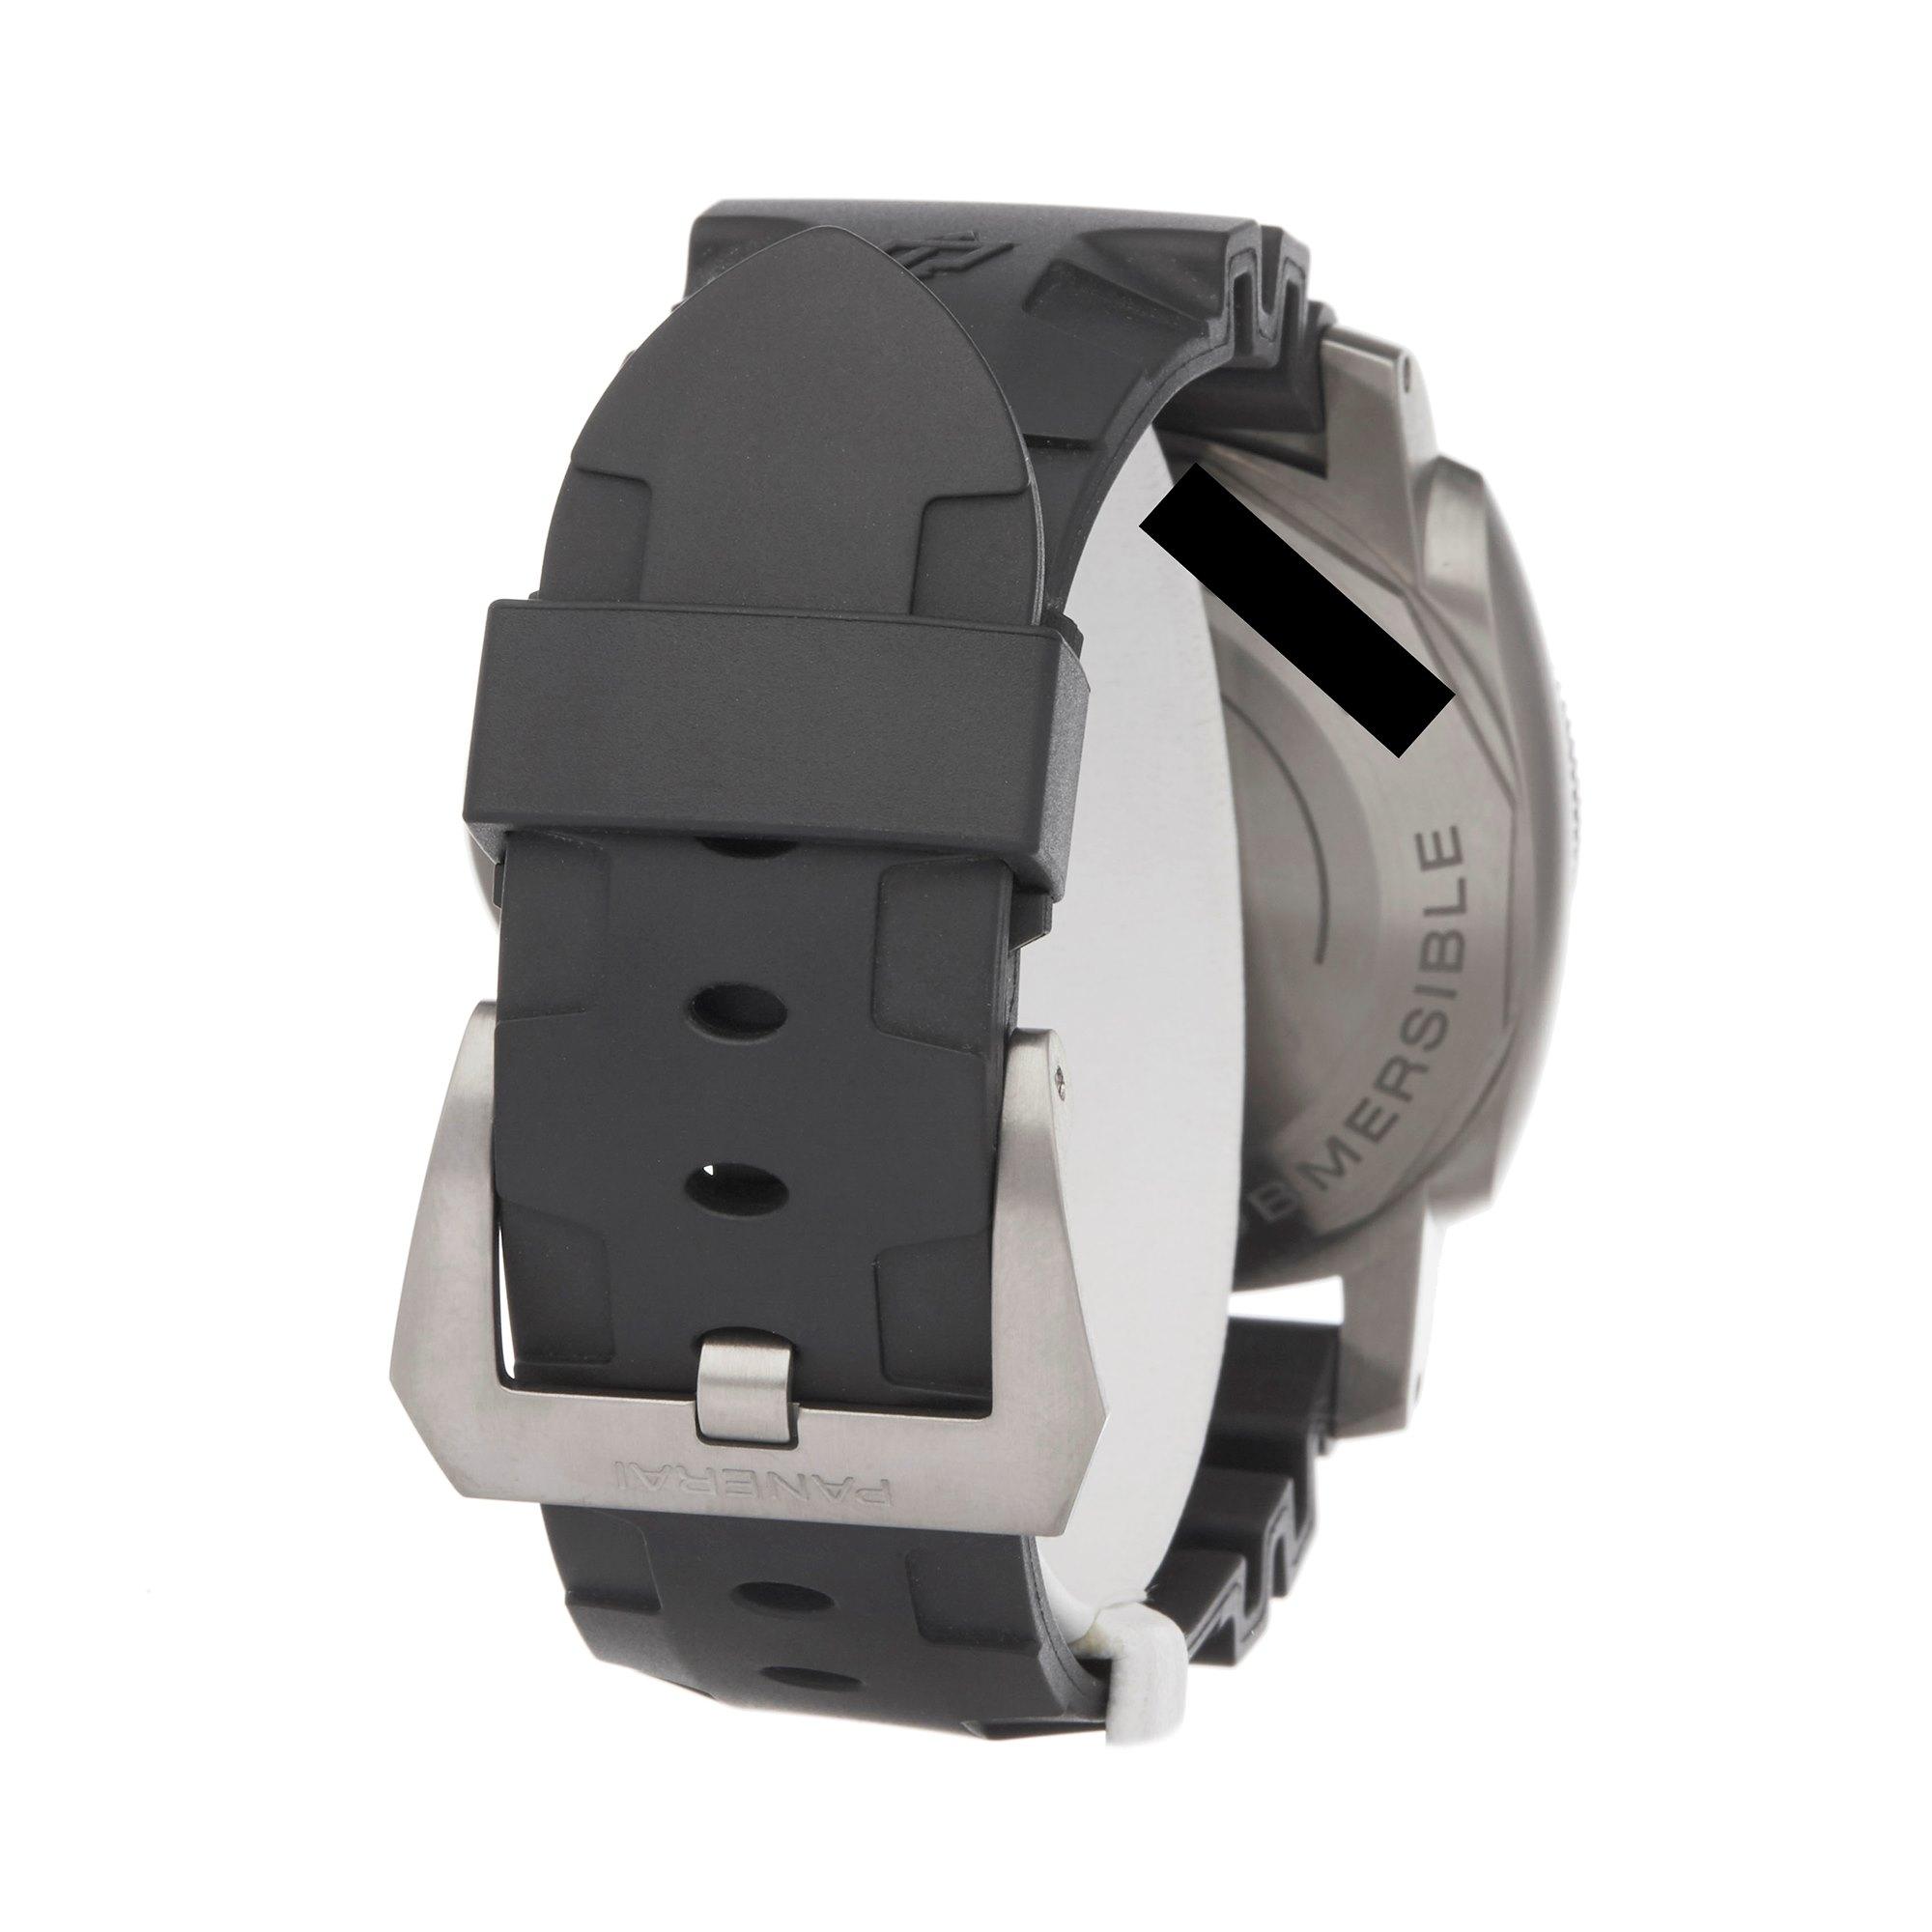 Panerai Luminor Pole 2 Pole Ltd 439/500 Titanium PAM00719